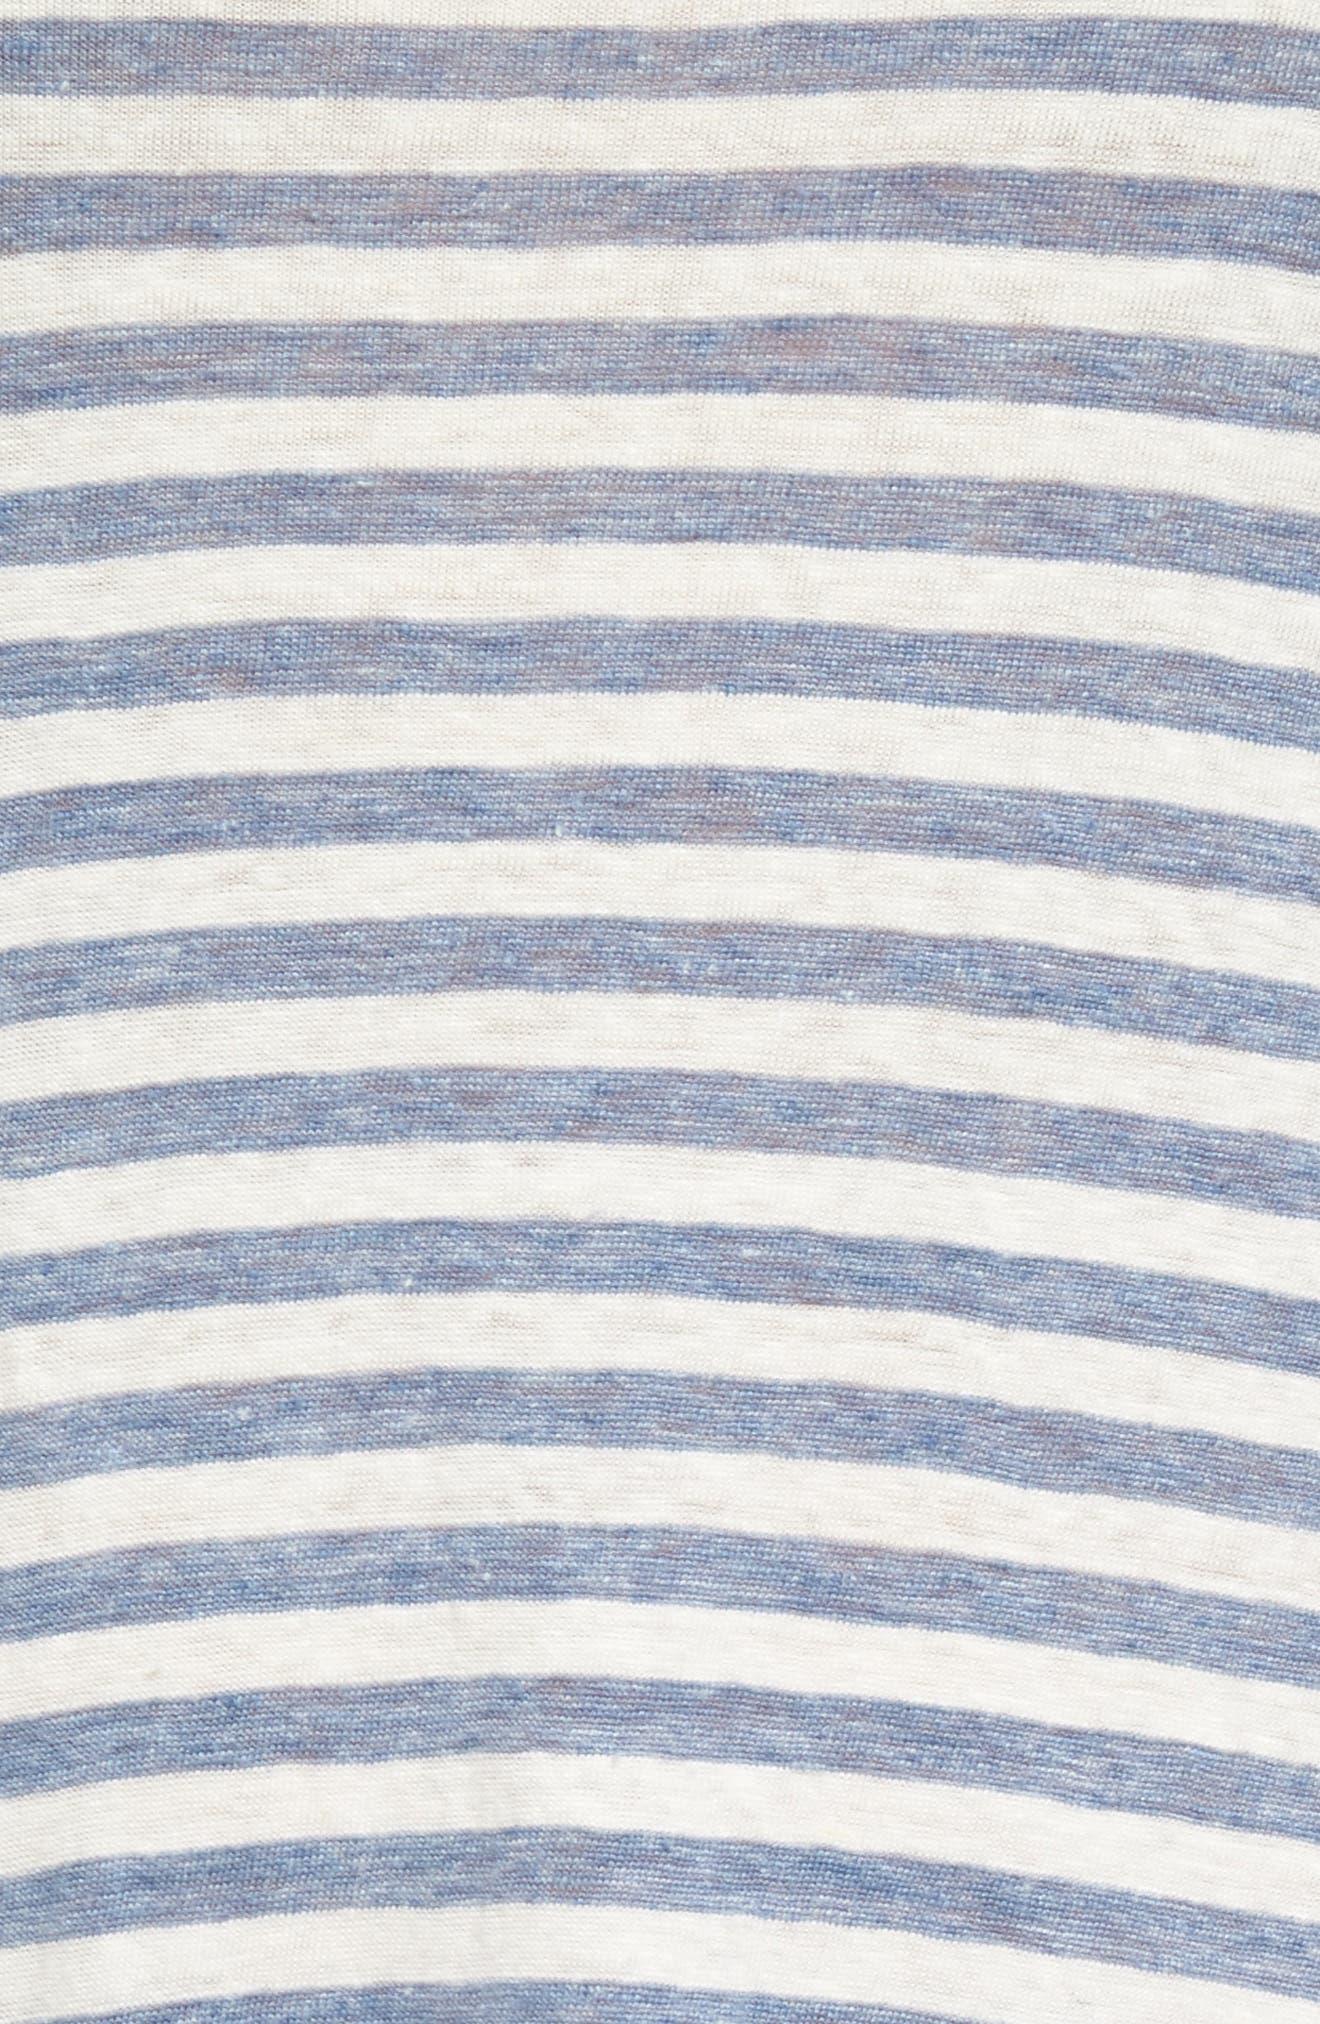 Avril Linen Tank Dress,                             Alternate thumbnail 5, color,                             Heather Blue/ Powder White